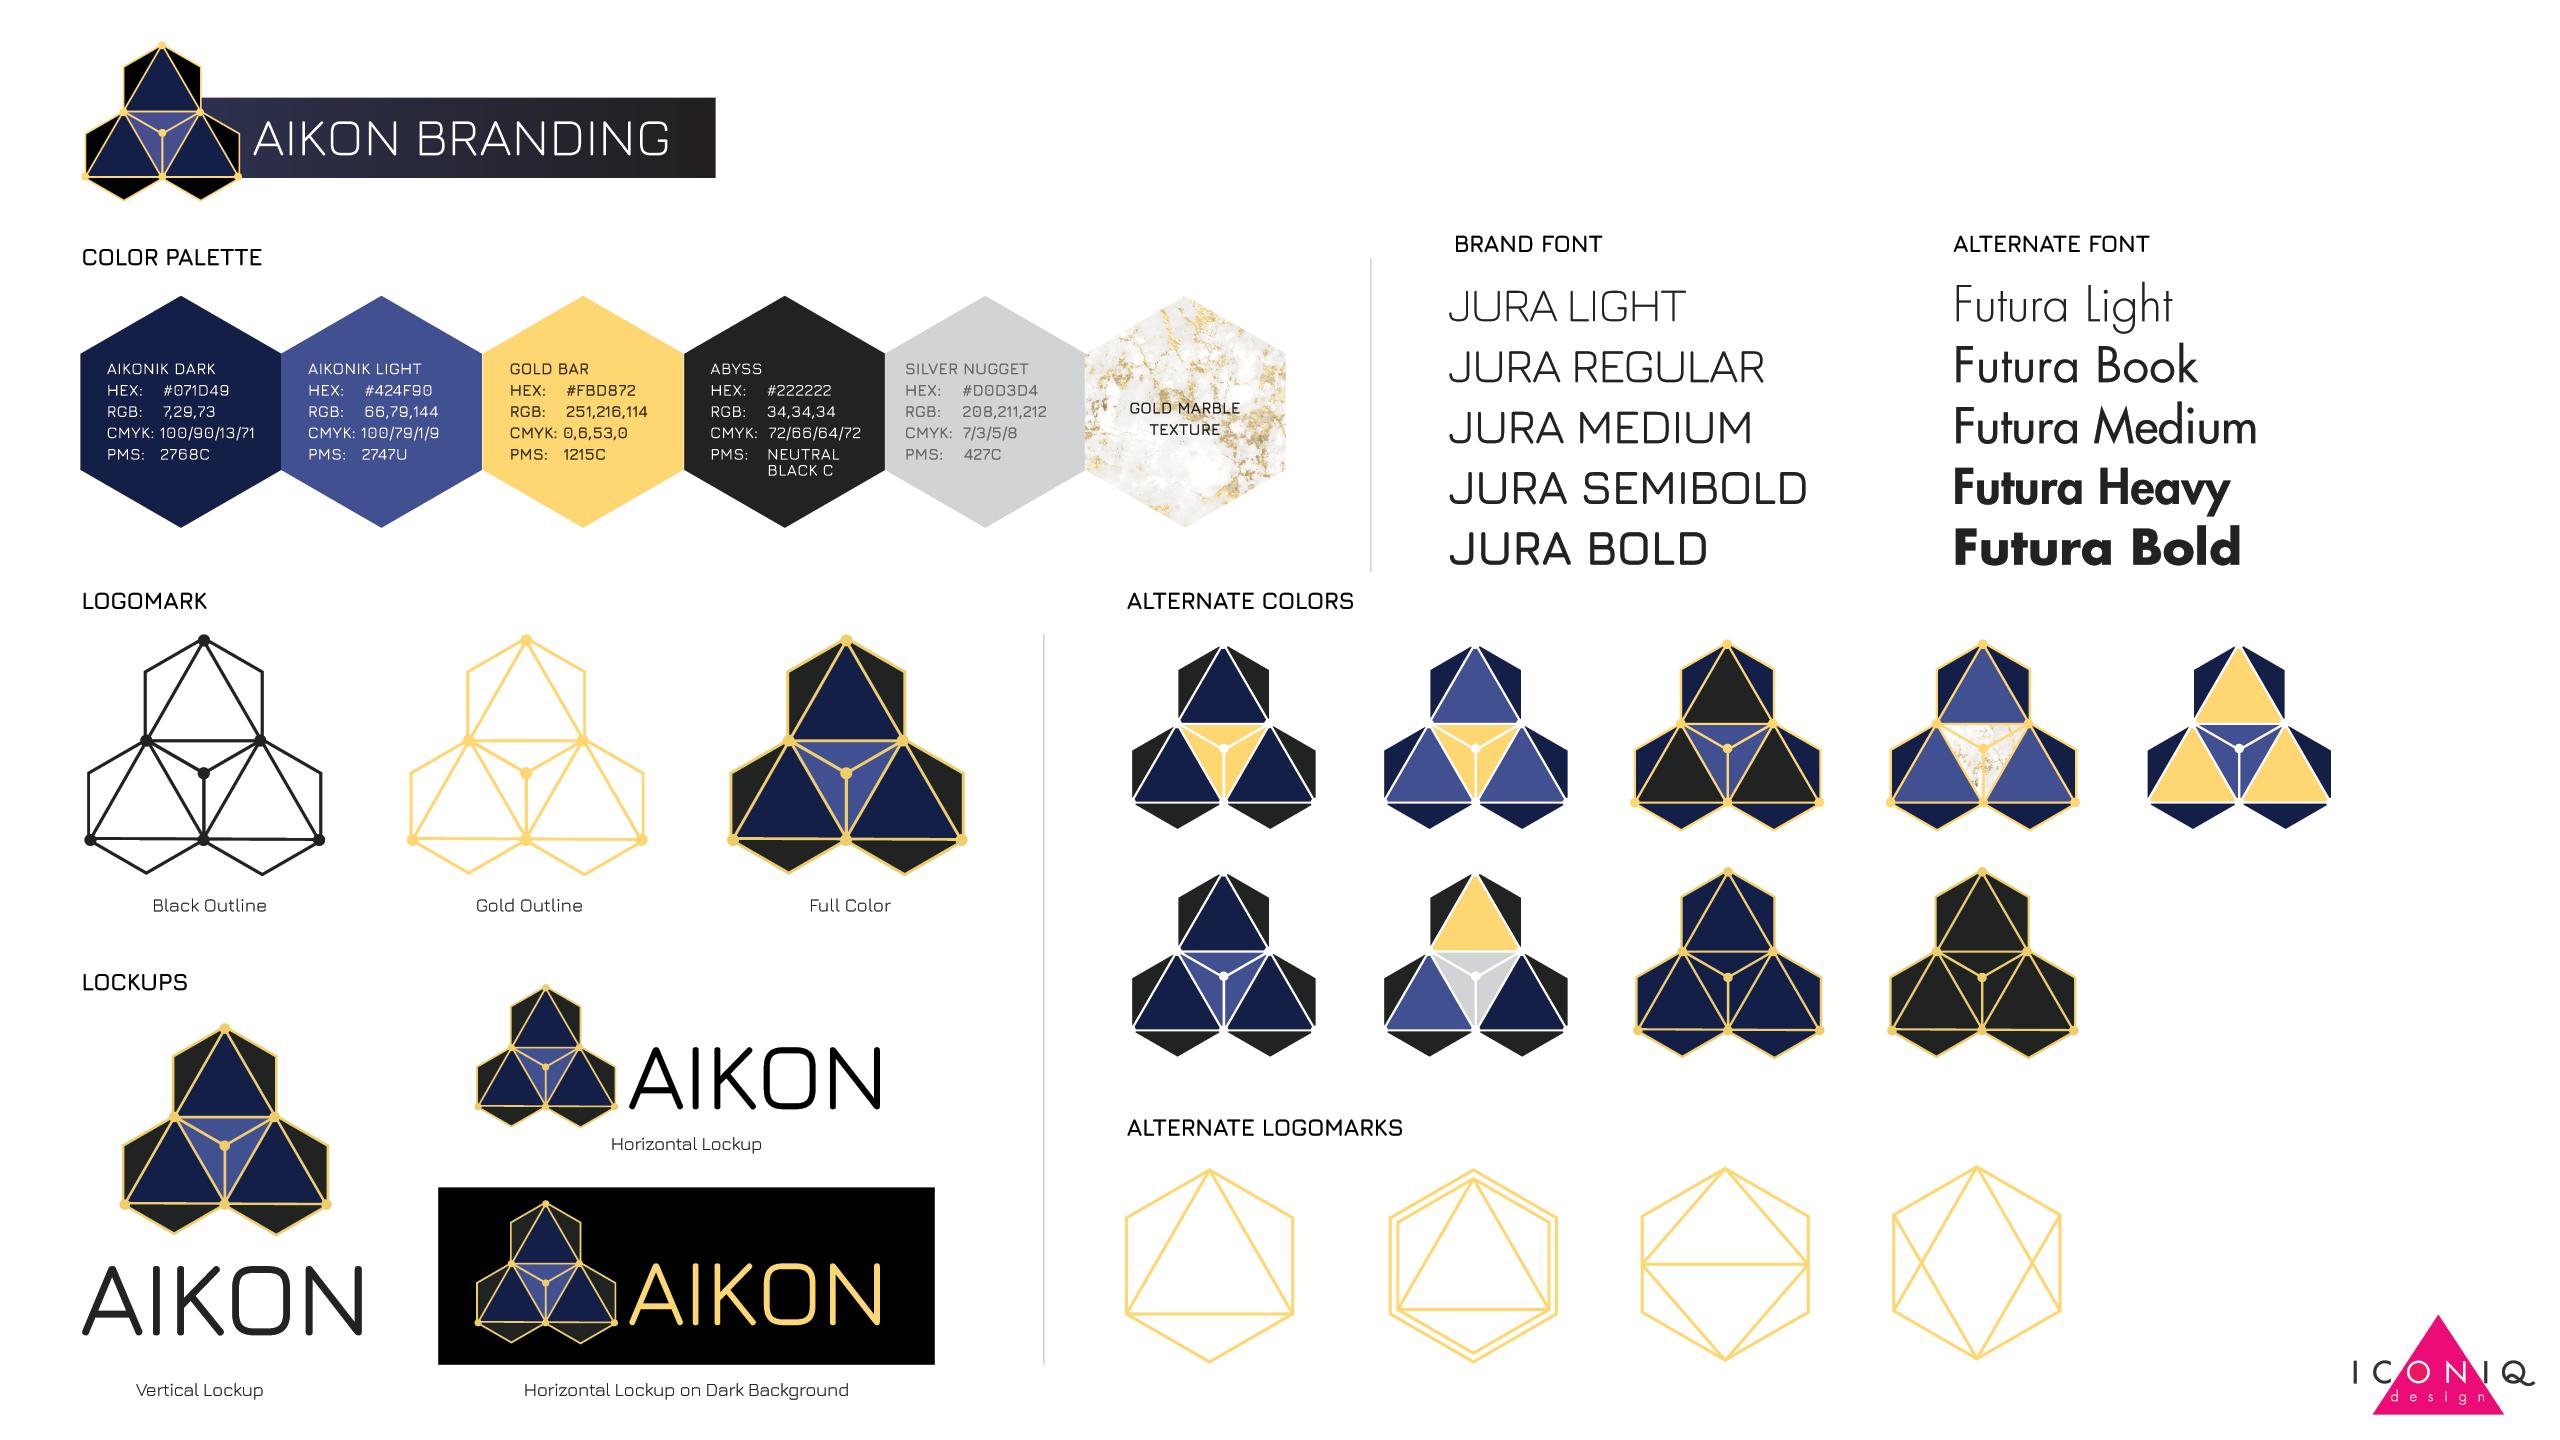 aikon-branding